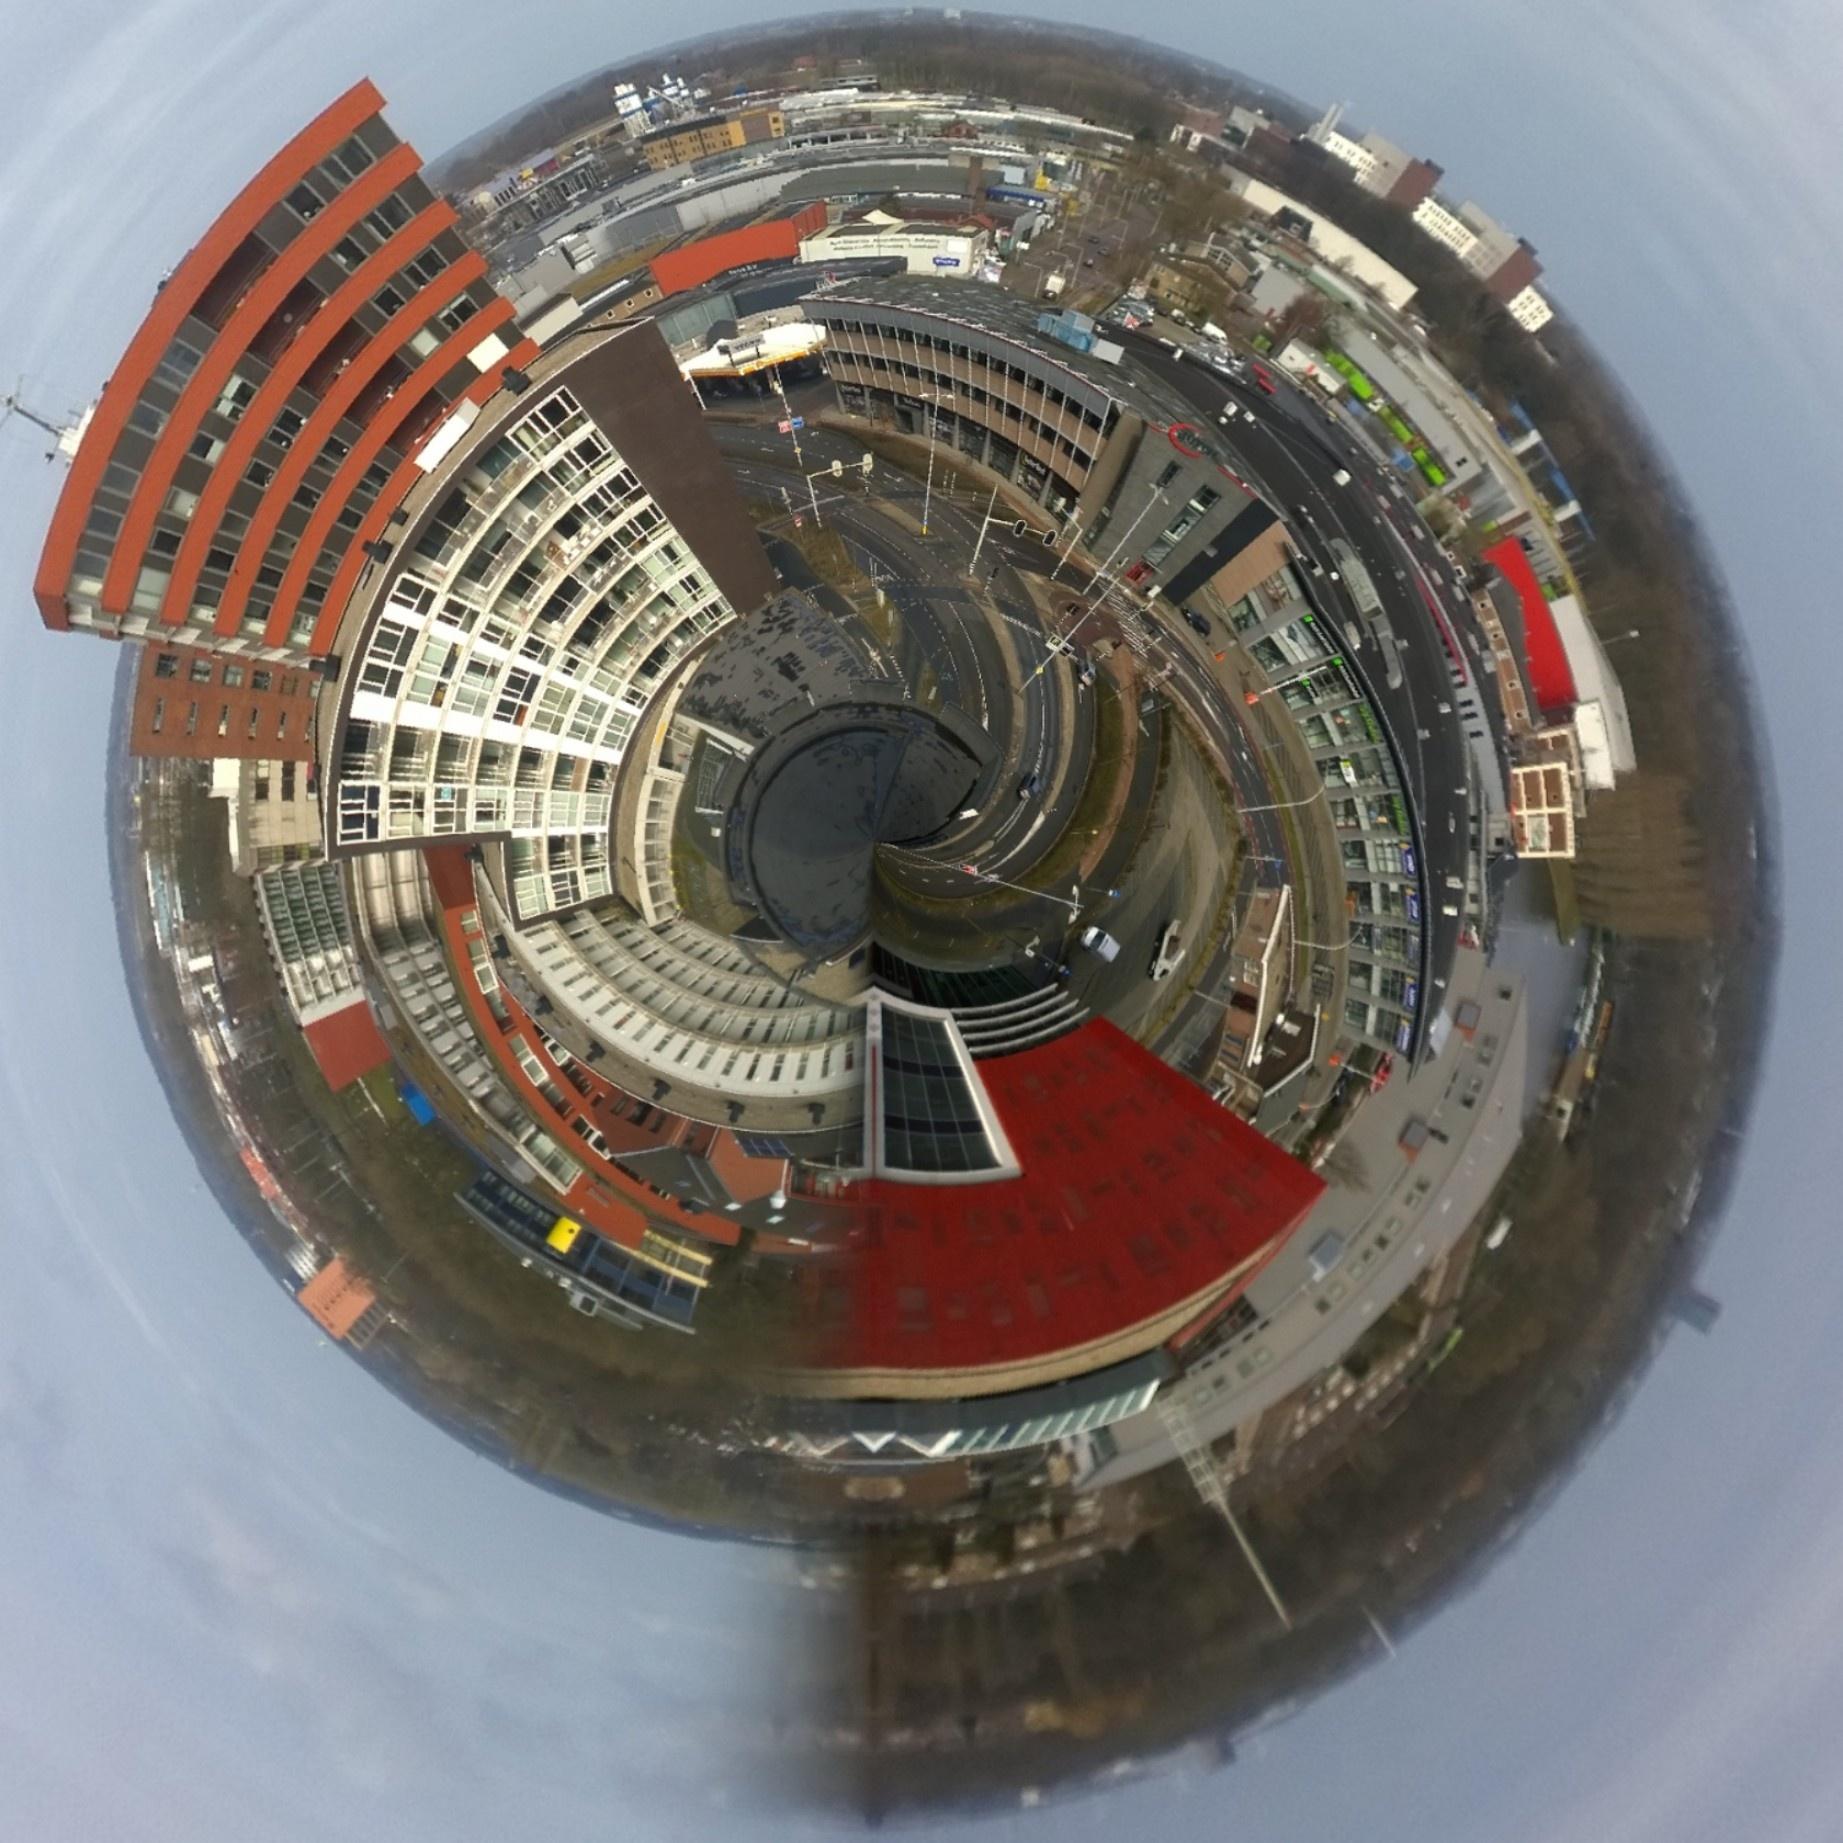 Dutch city Amersfoort on the 8th floor by roggy.douglas